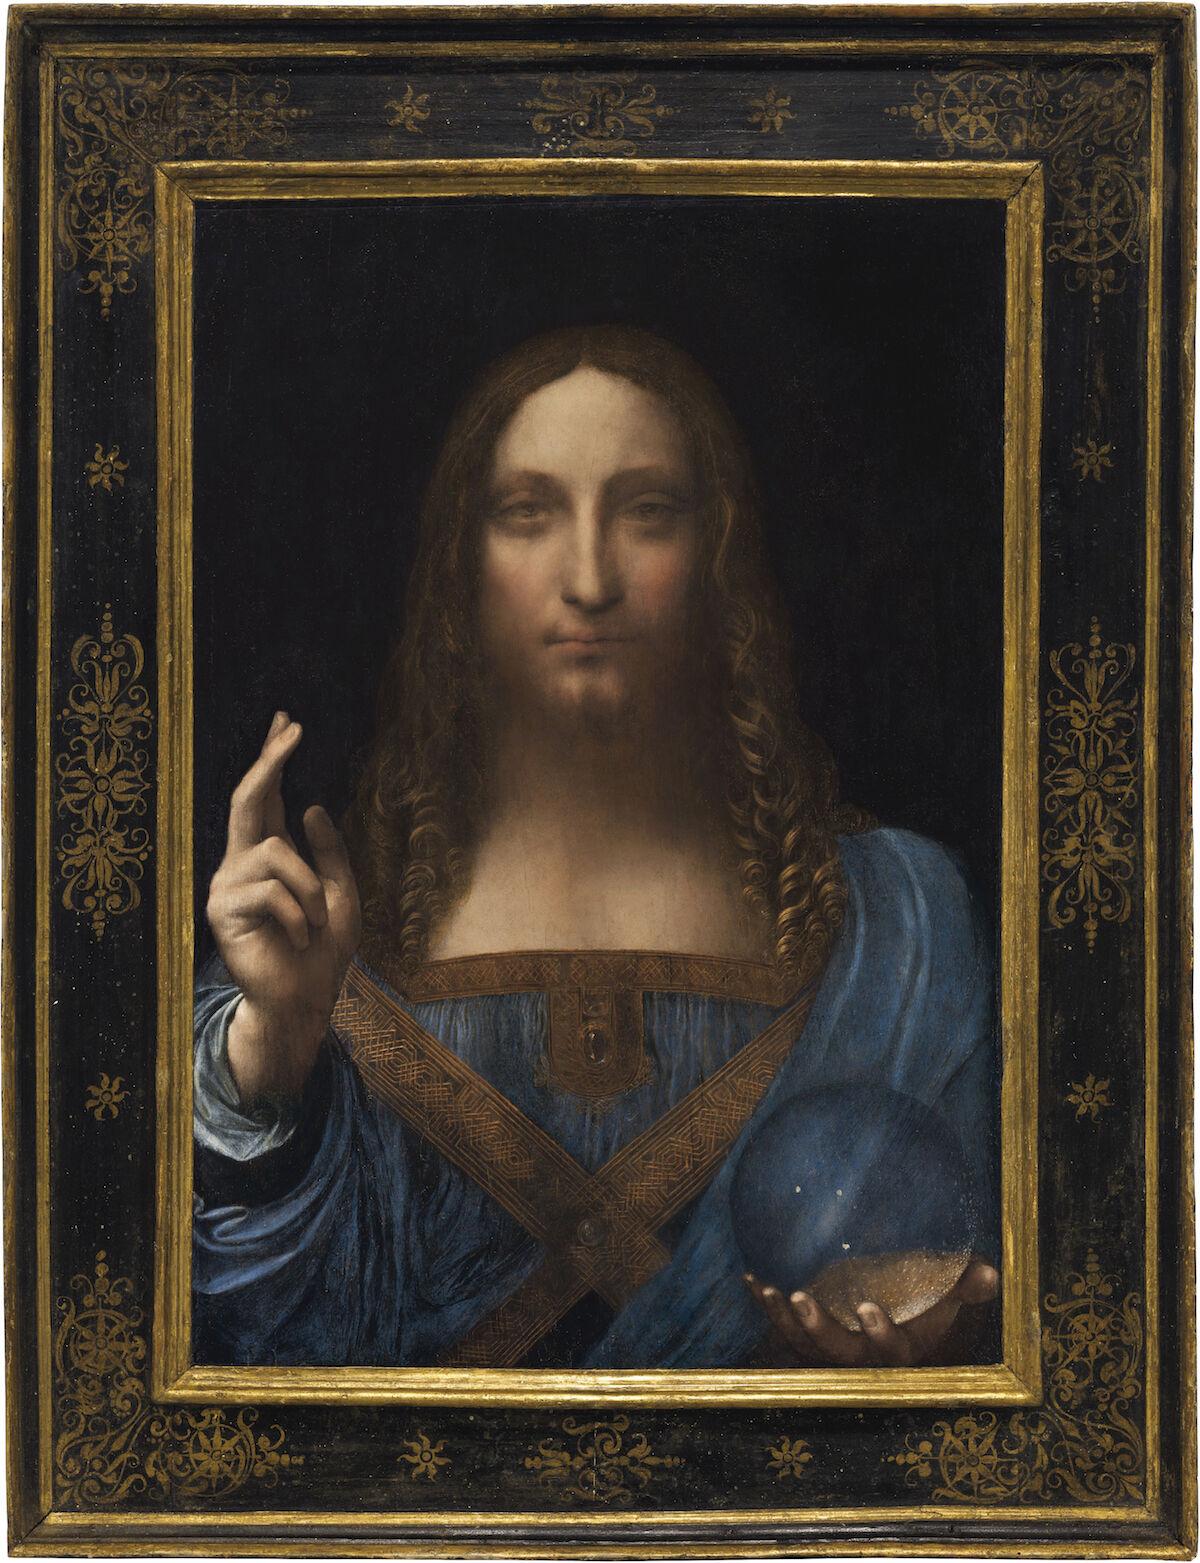 Leonardo da Vinci, Salvator Mundi, circa 1500. Courtesy Abu Dhabi Tourism & Culture Authority, via Wikimedia Commons.